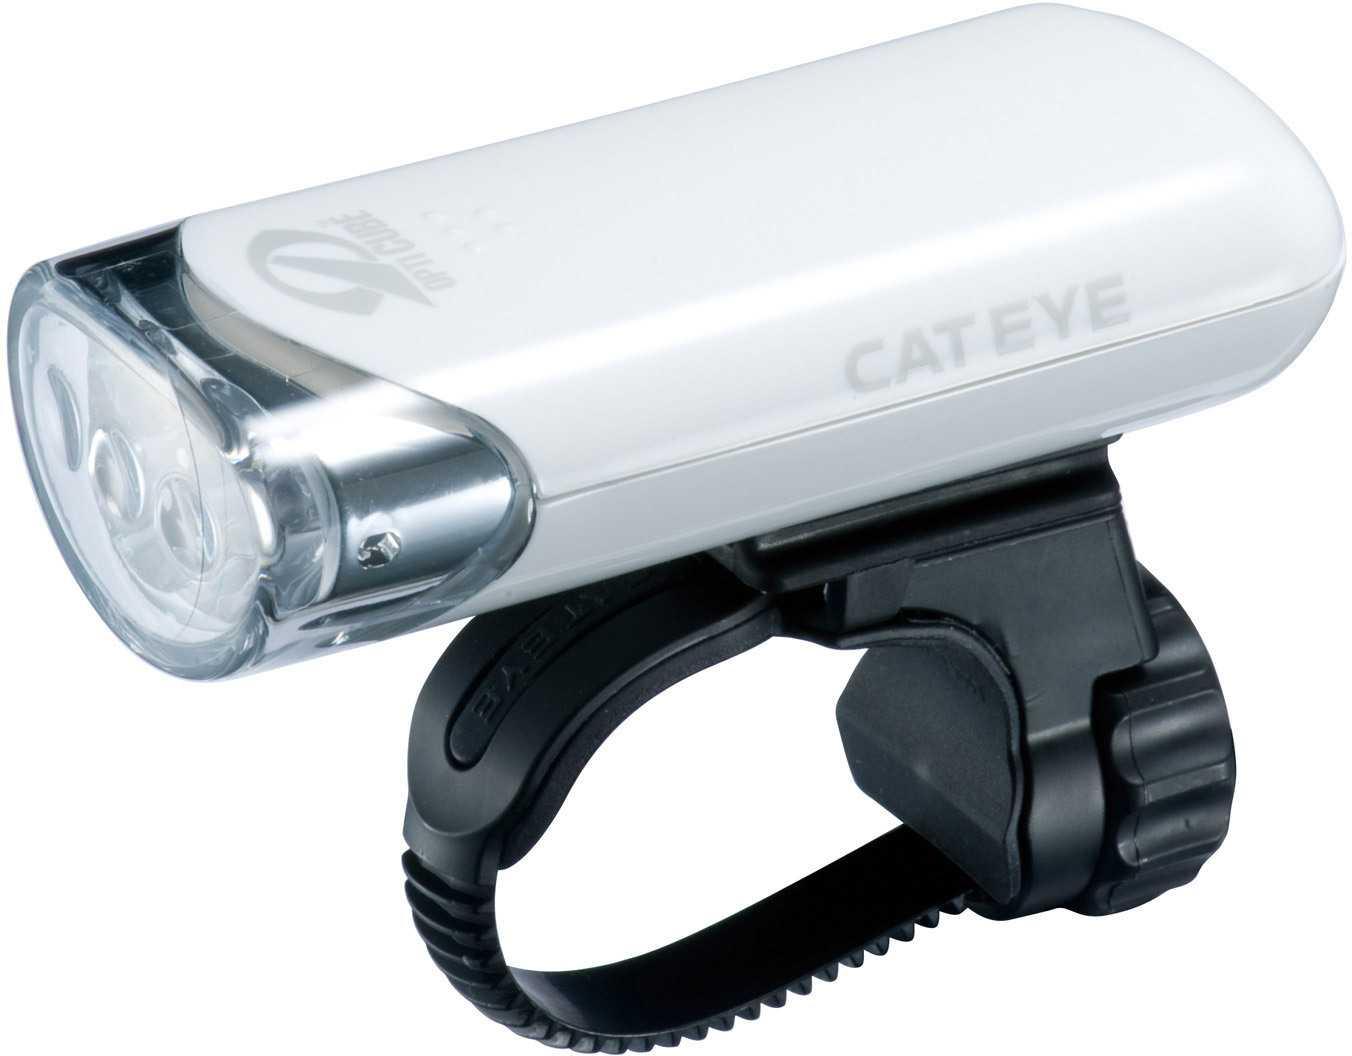 Framlampa Cateye HL-EL135 vit